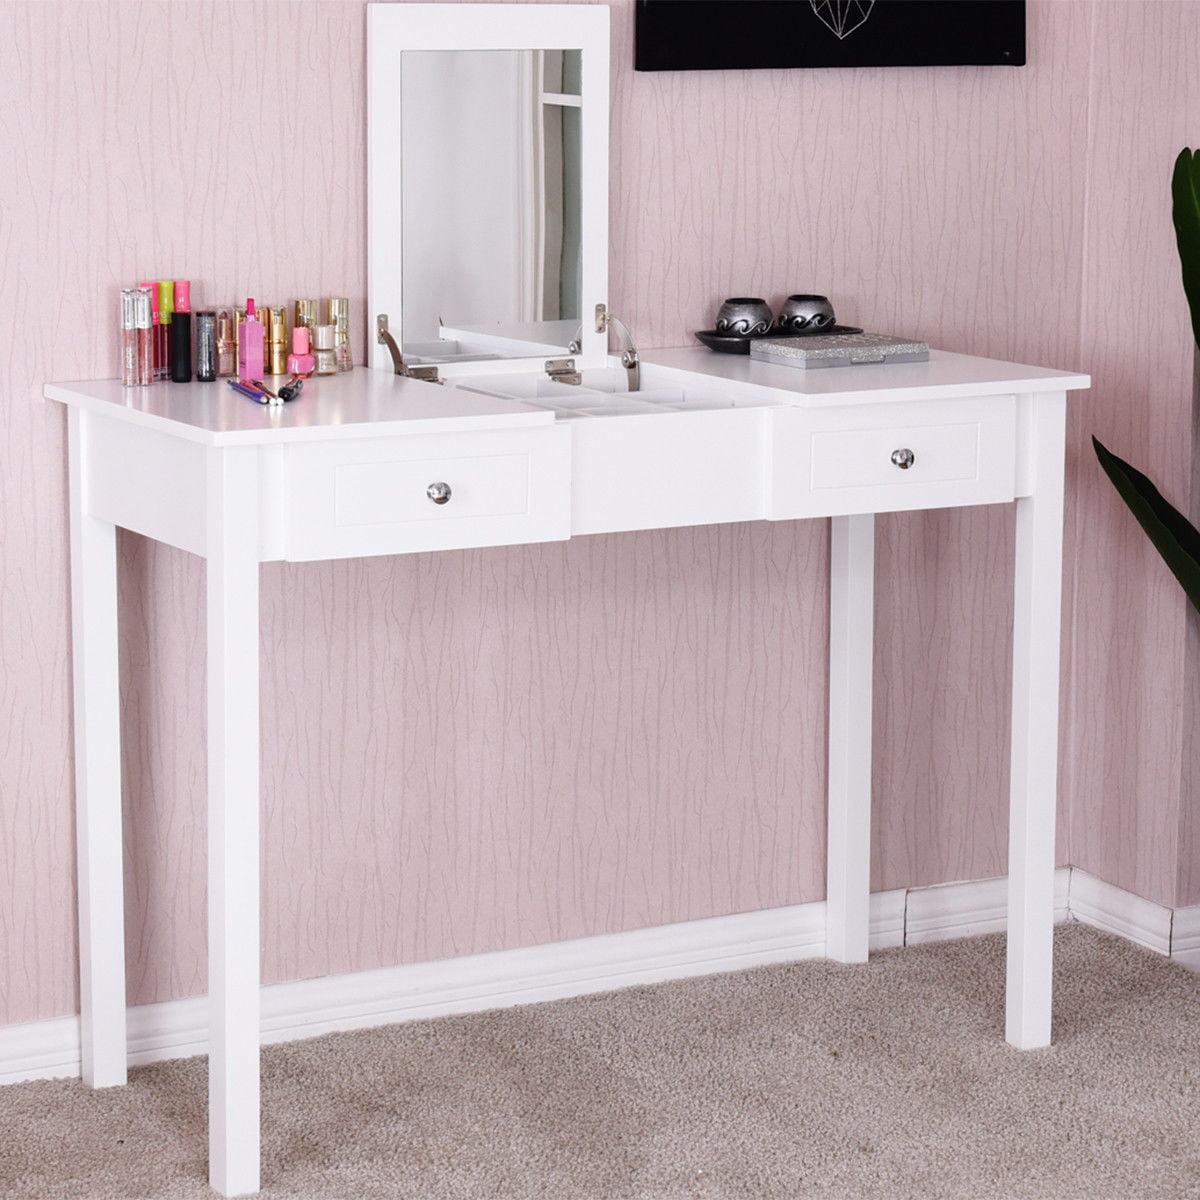 Costway Vanity Table Dressing Table Flip Top Desk Mirror 2 Drawers Furniture White by Costway